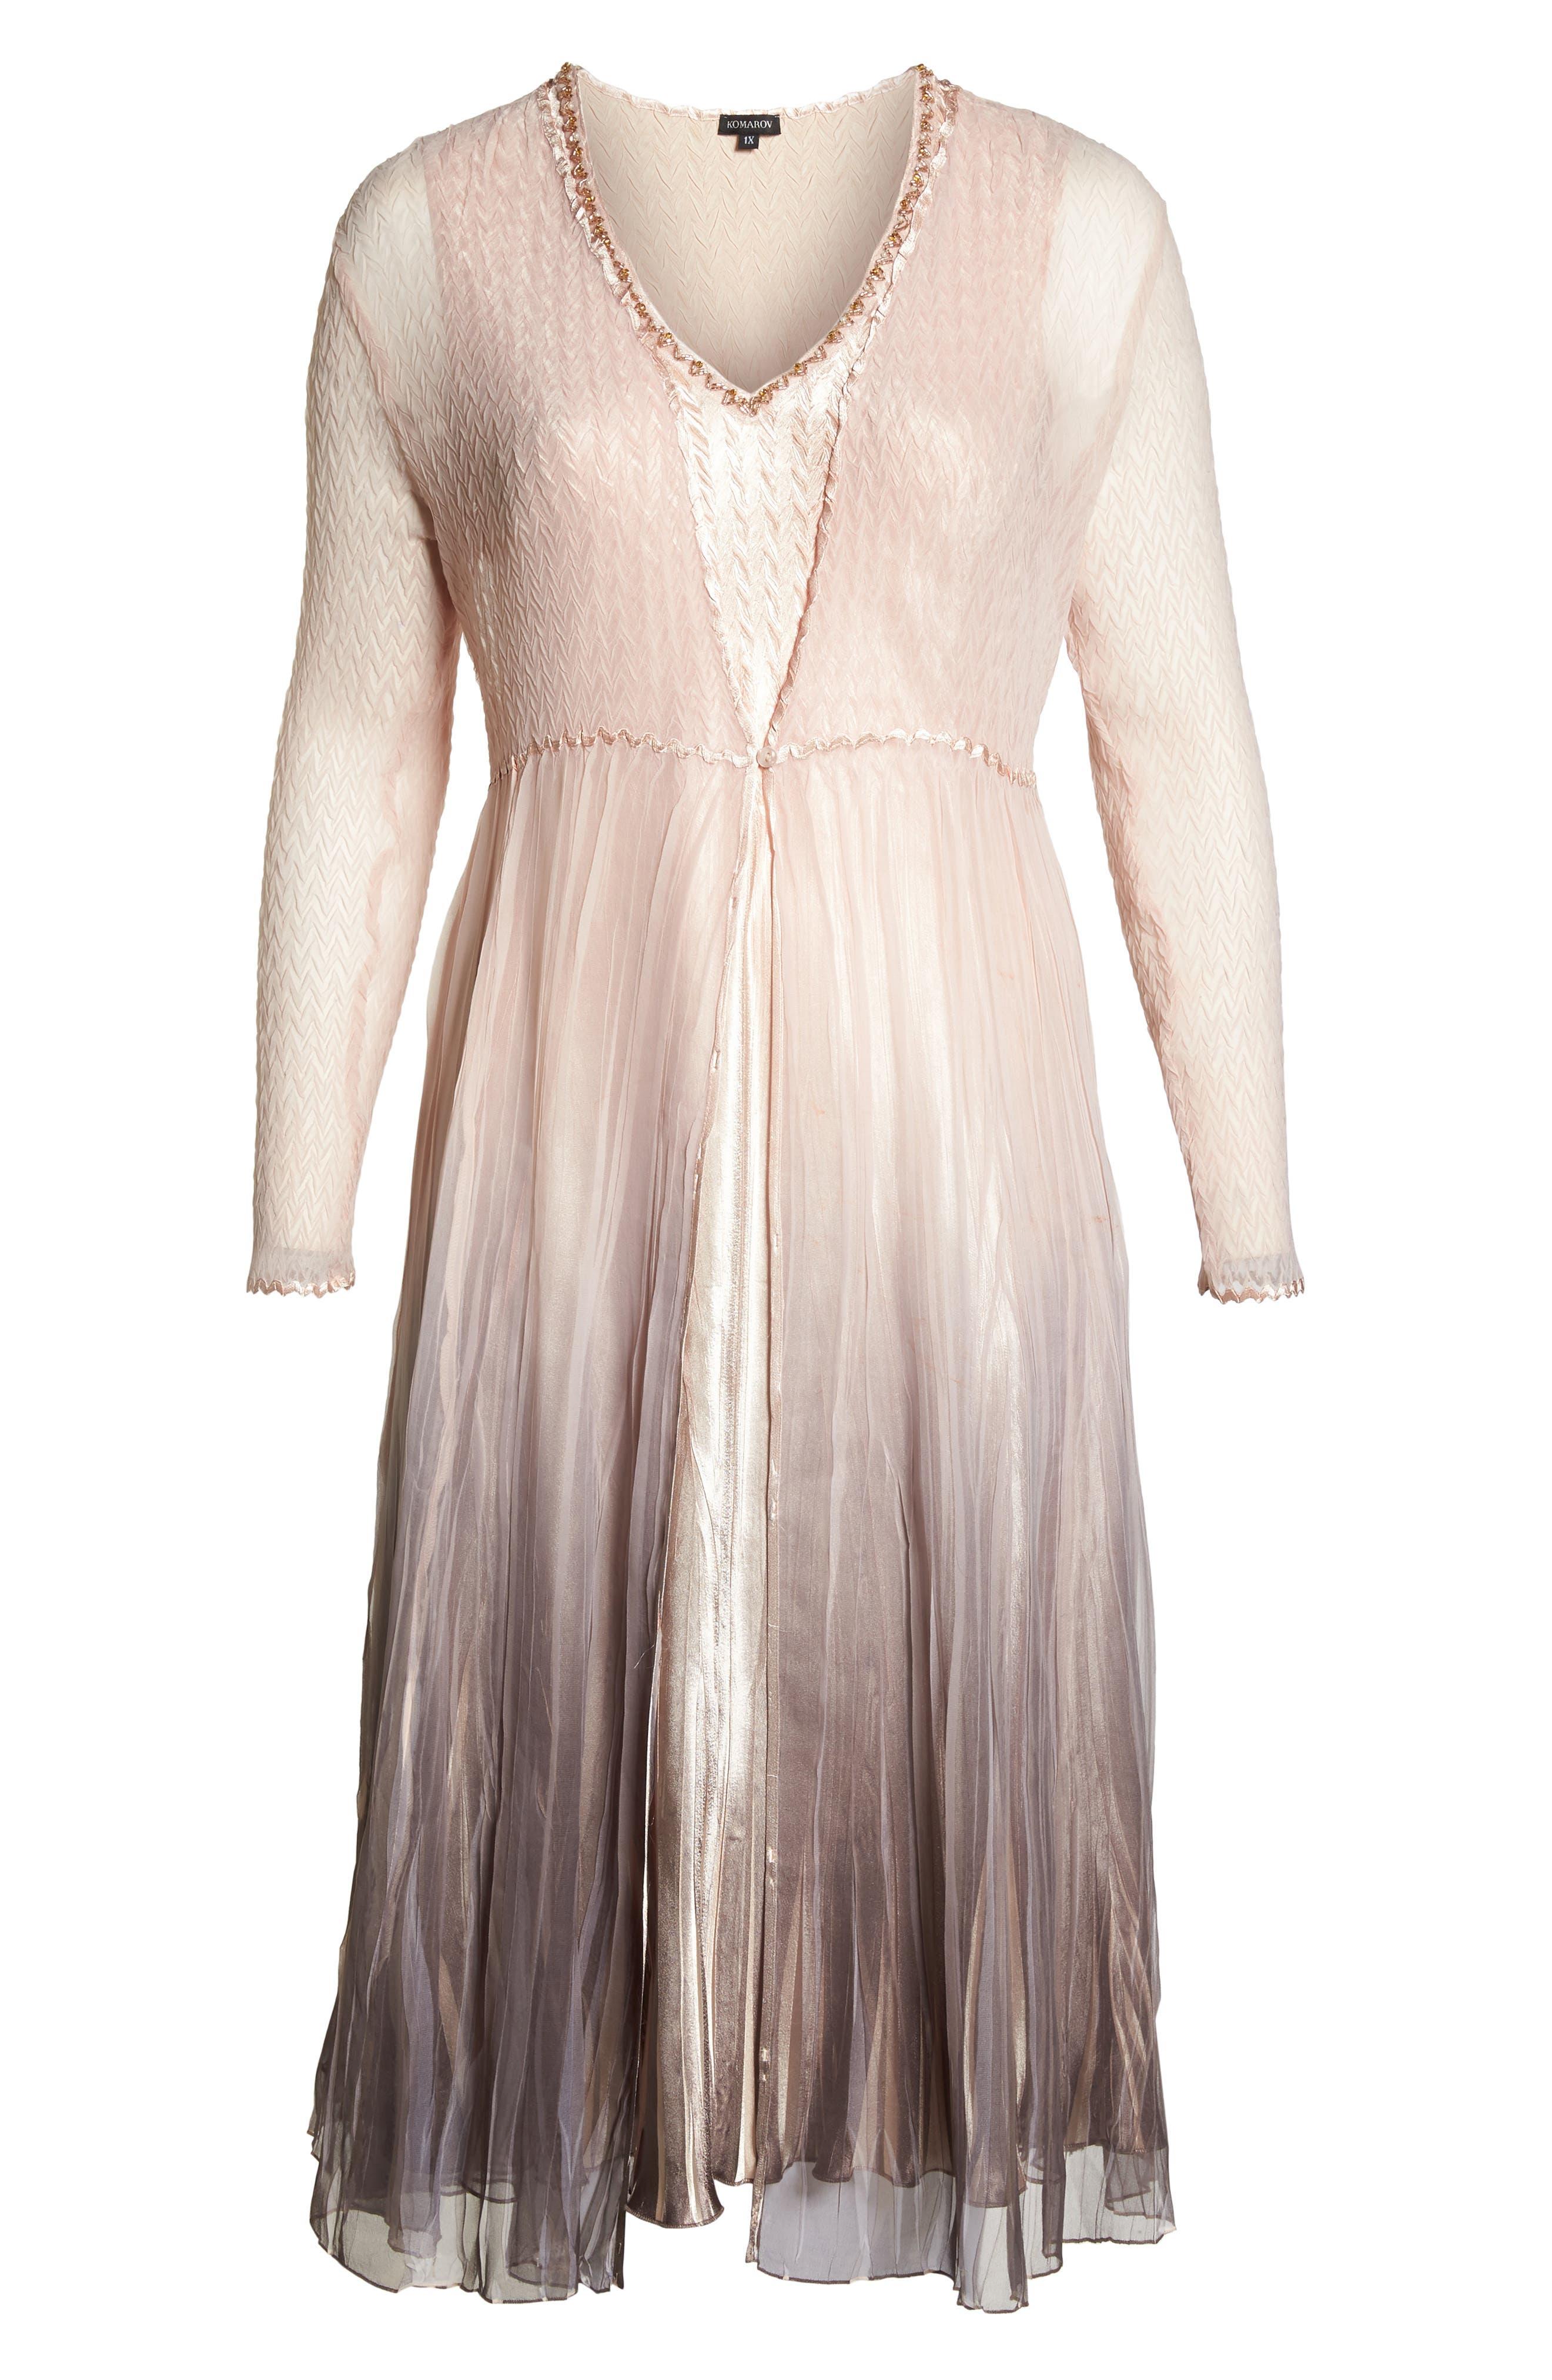 Beaded Neck Charmeuse Dress & Jacket,                             Alternate thumbnail 6, color,                             250